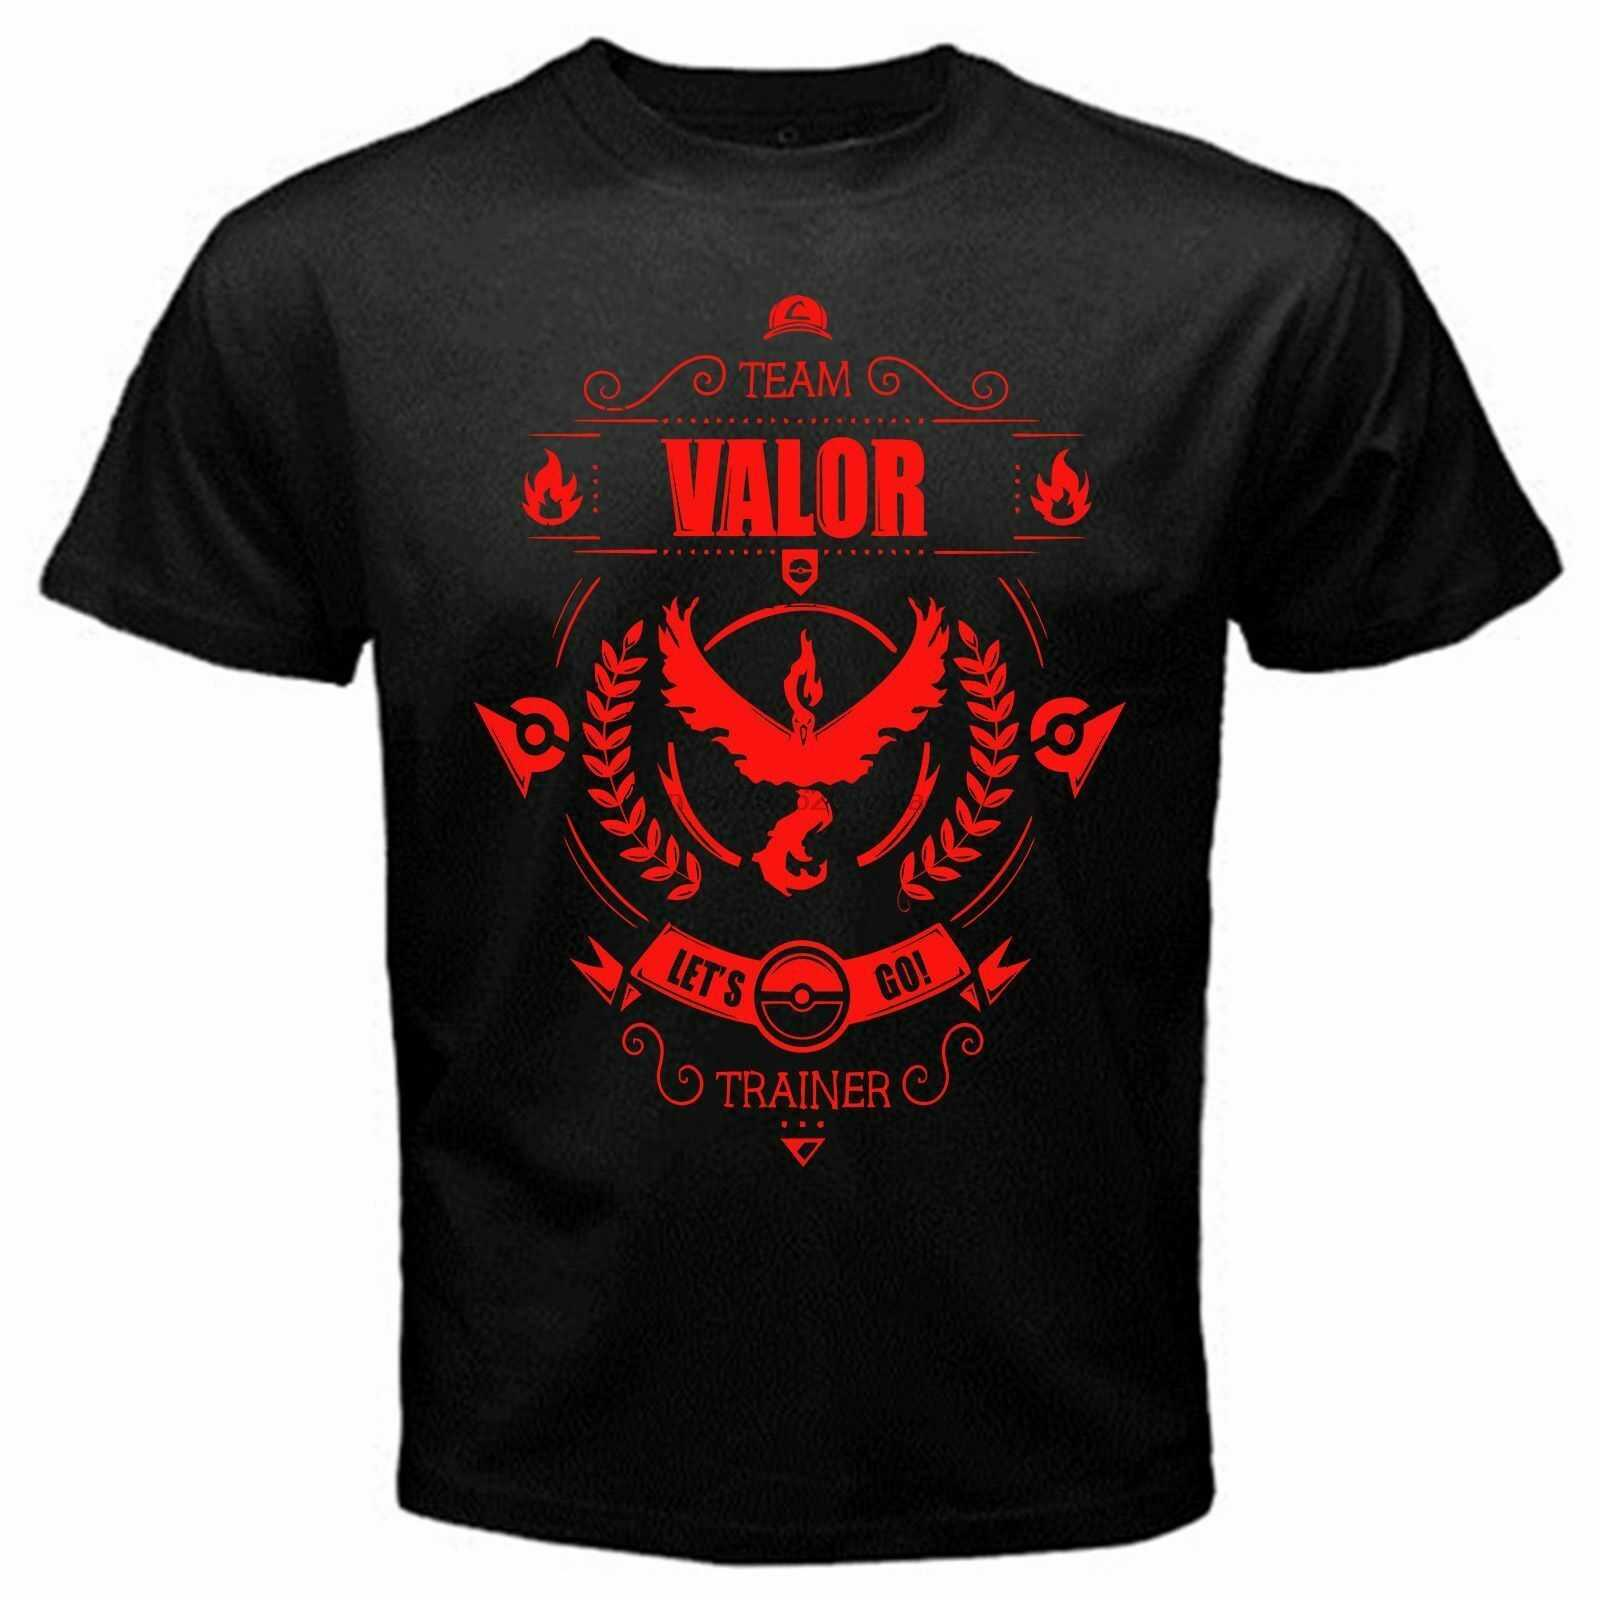 New Team Valor Trainer Pokem3on Anime Japan Classic T-Shirt Black Basic Usa Size